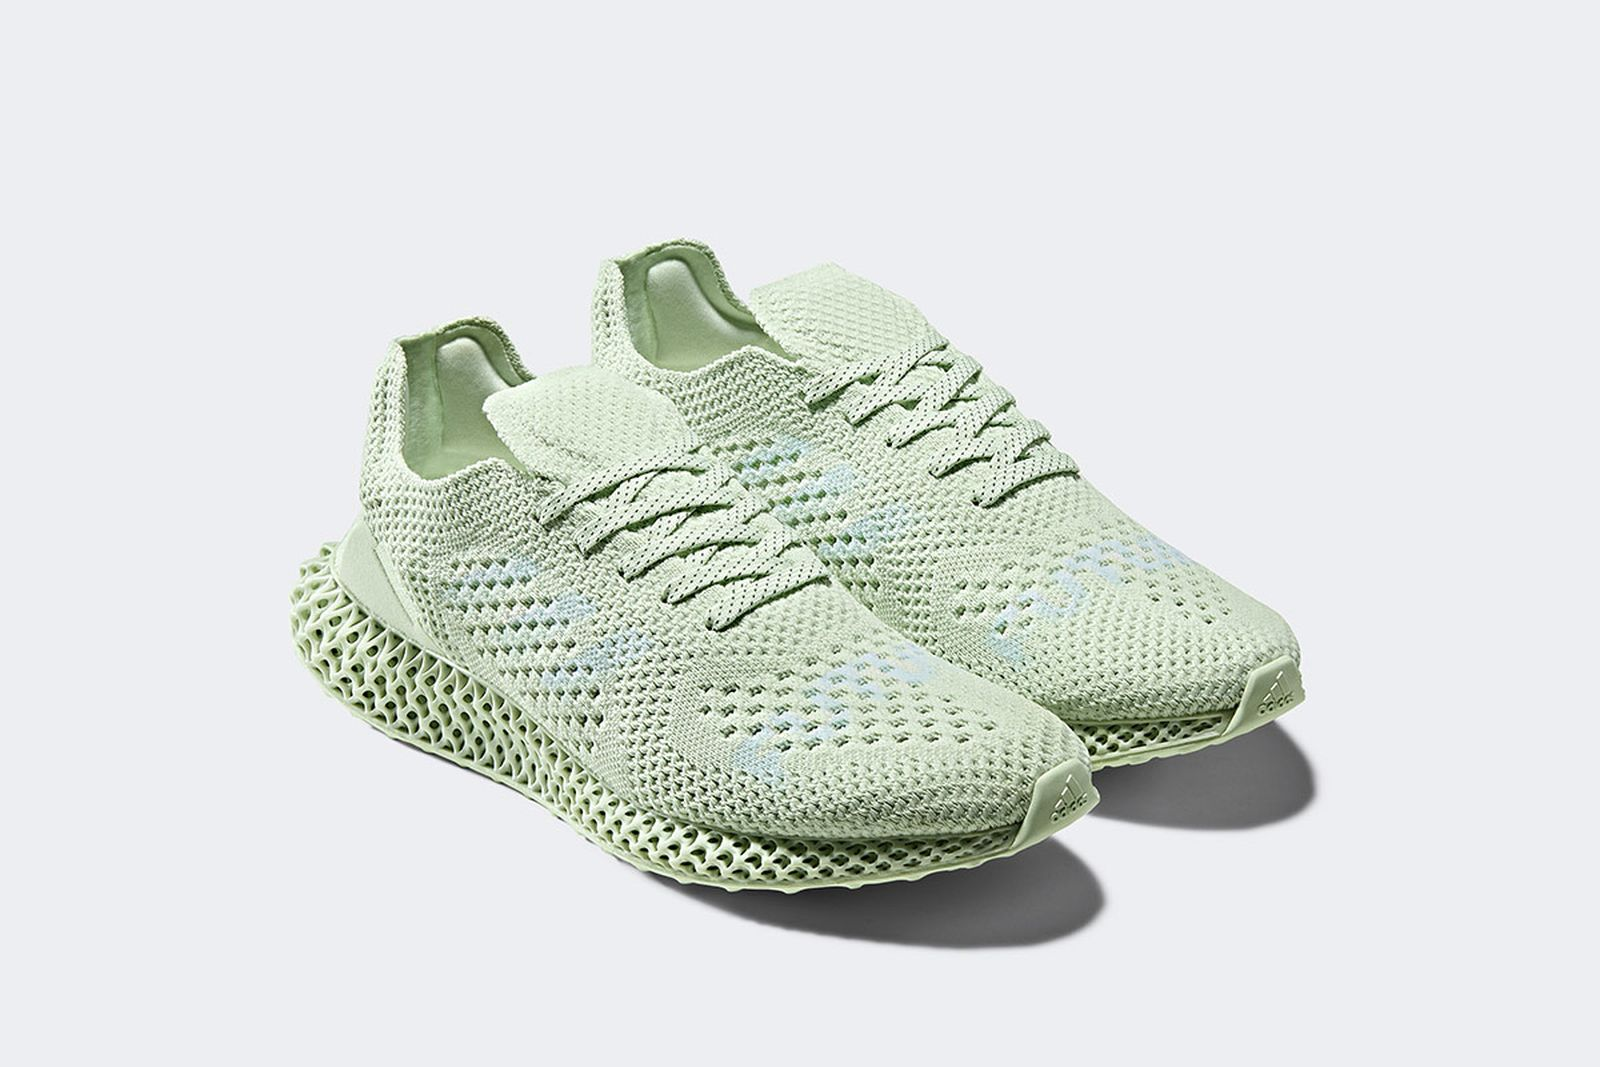 daniel arsham adidas futurecraft 4d release date price